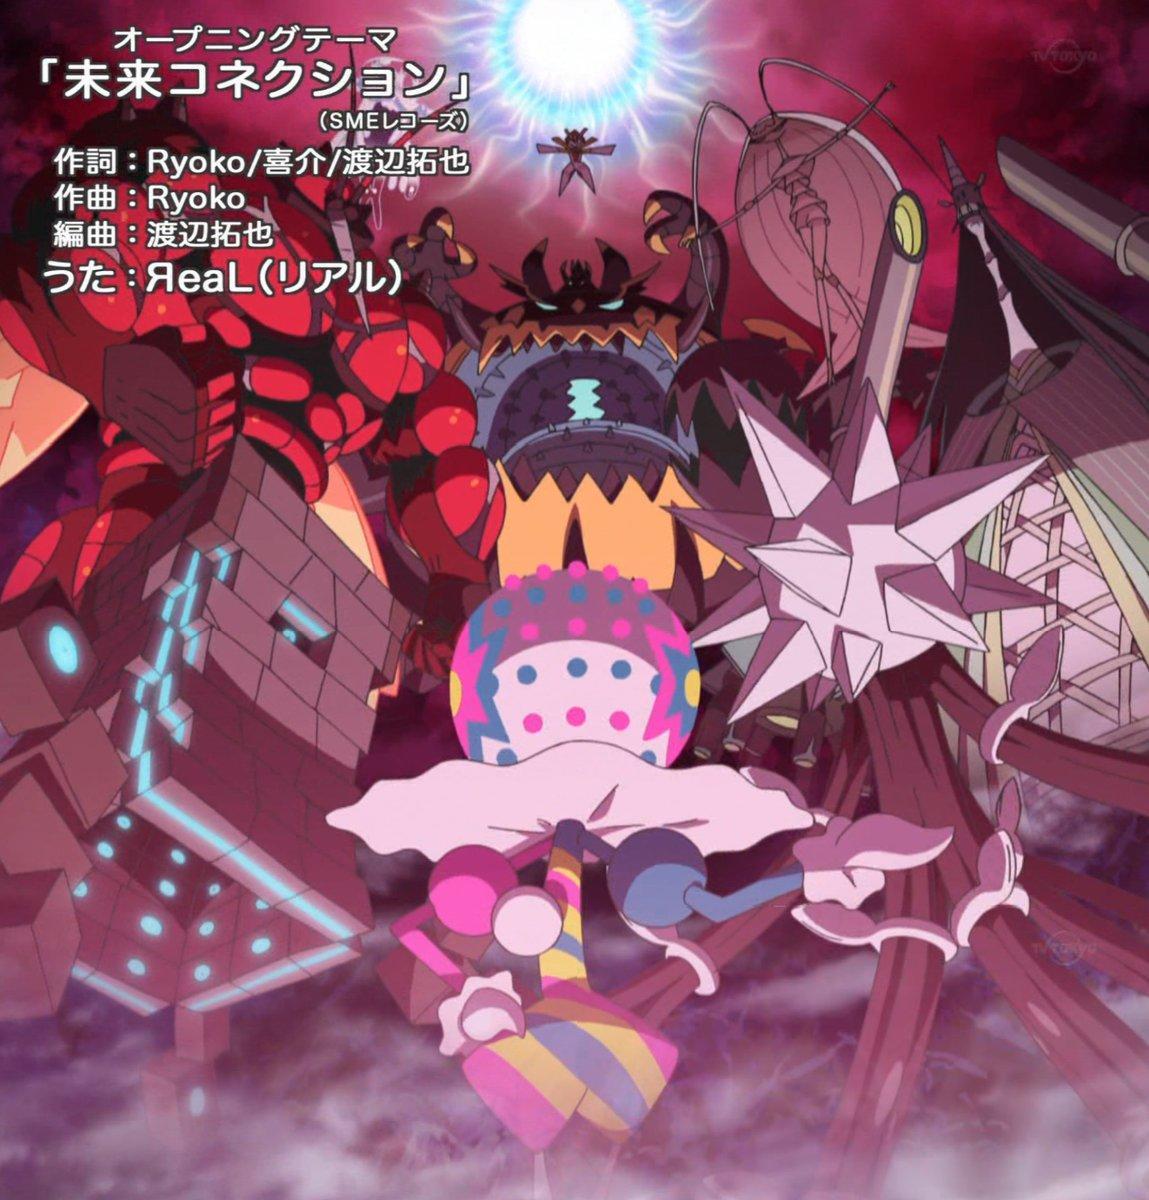 The anime's new opening | Pokémon Sun and Moon